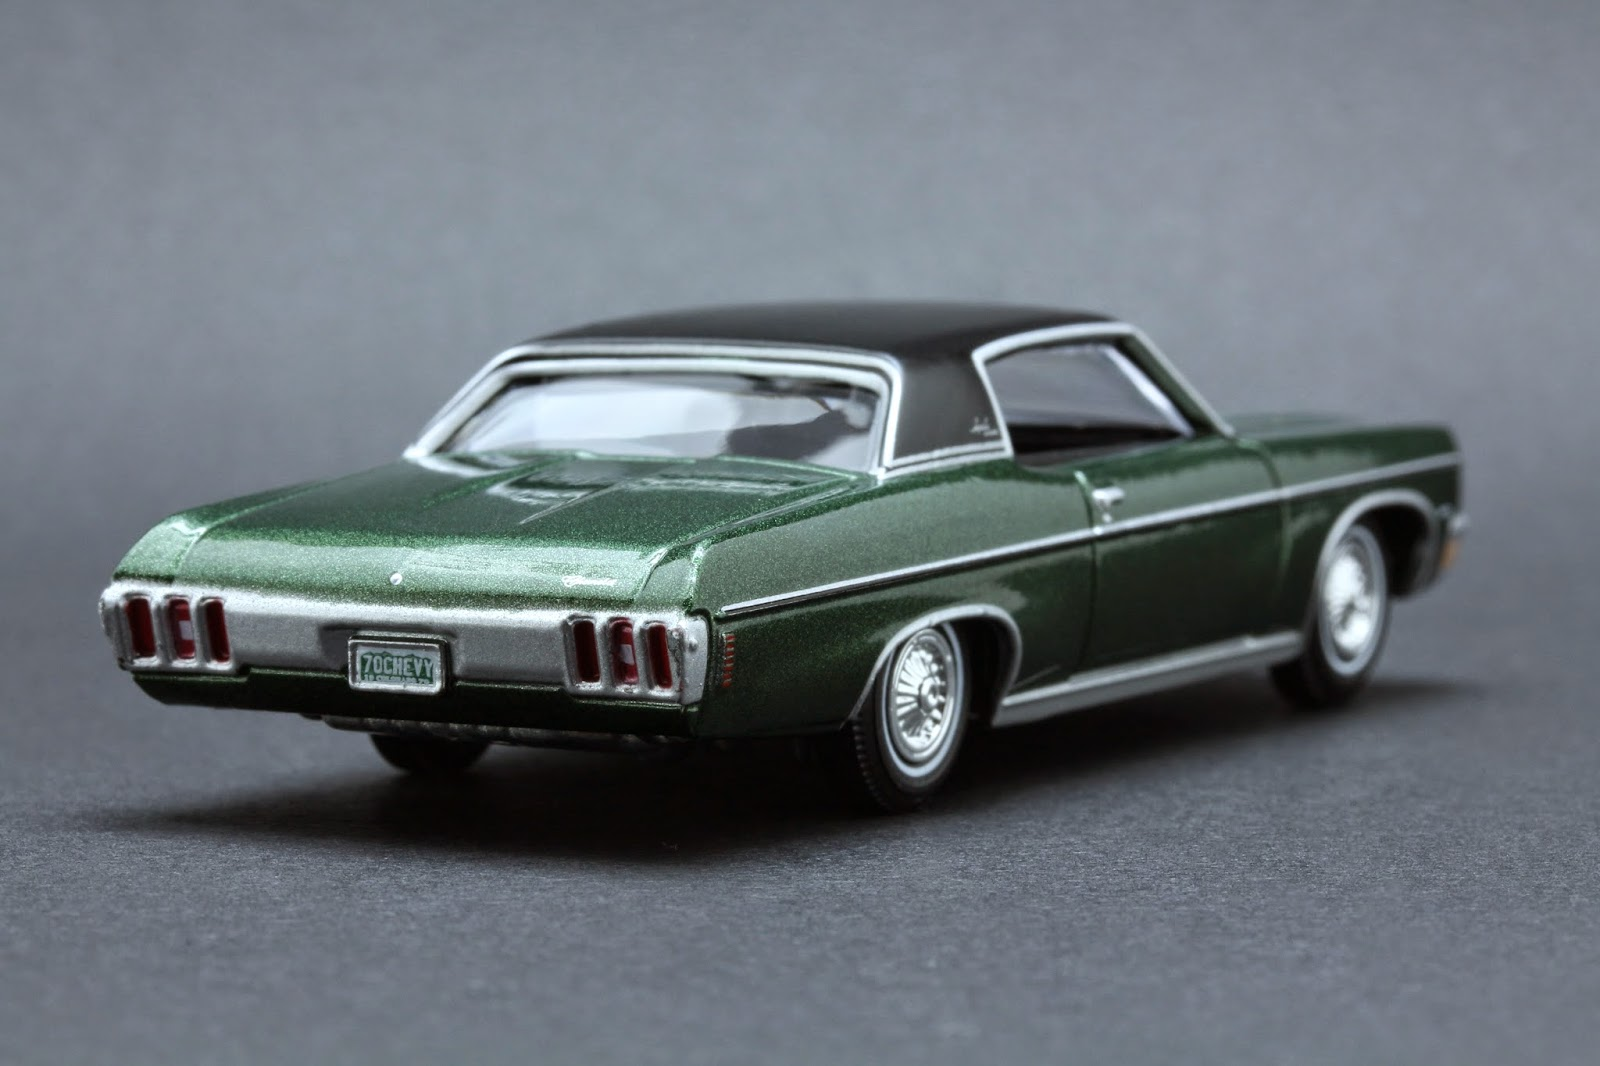 Diecast hobbist 1970 chevrolet impala custom coupe